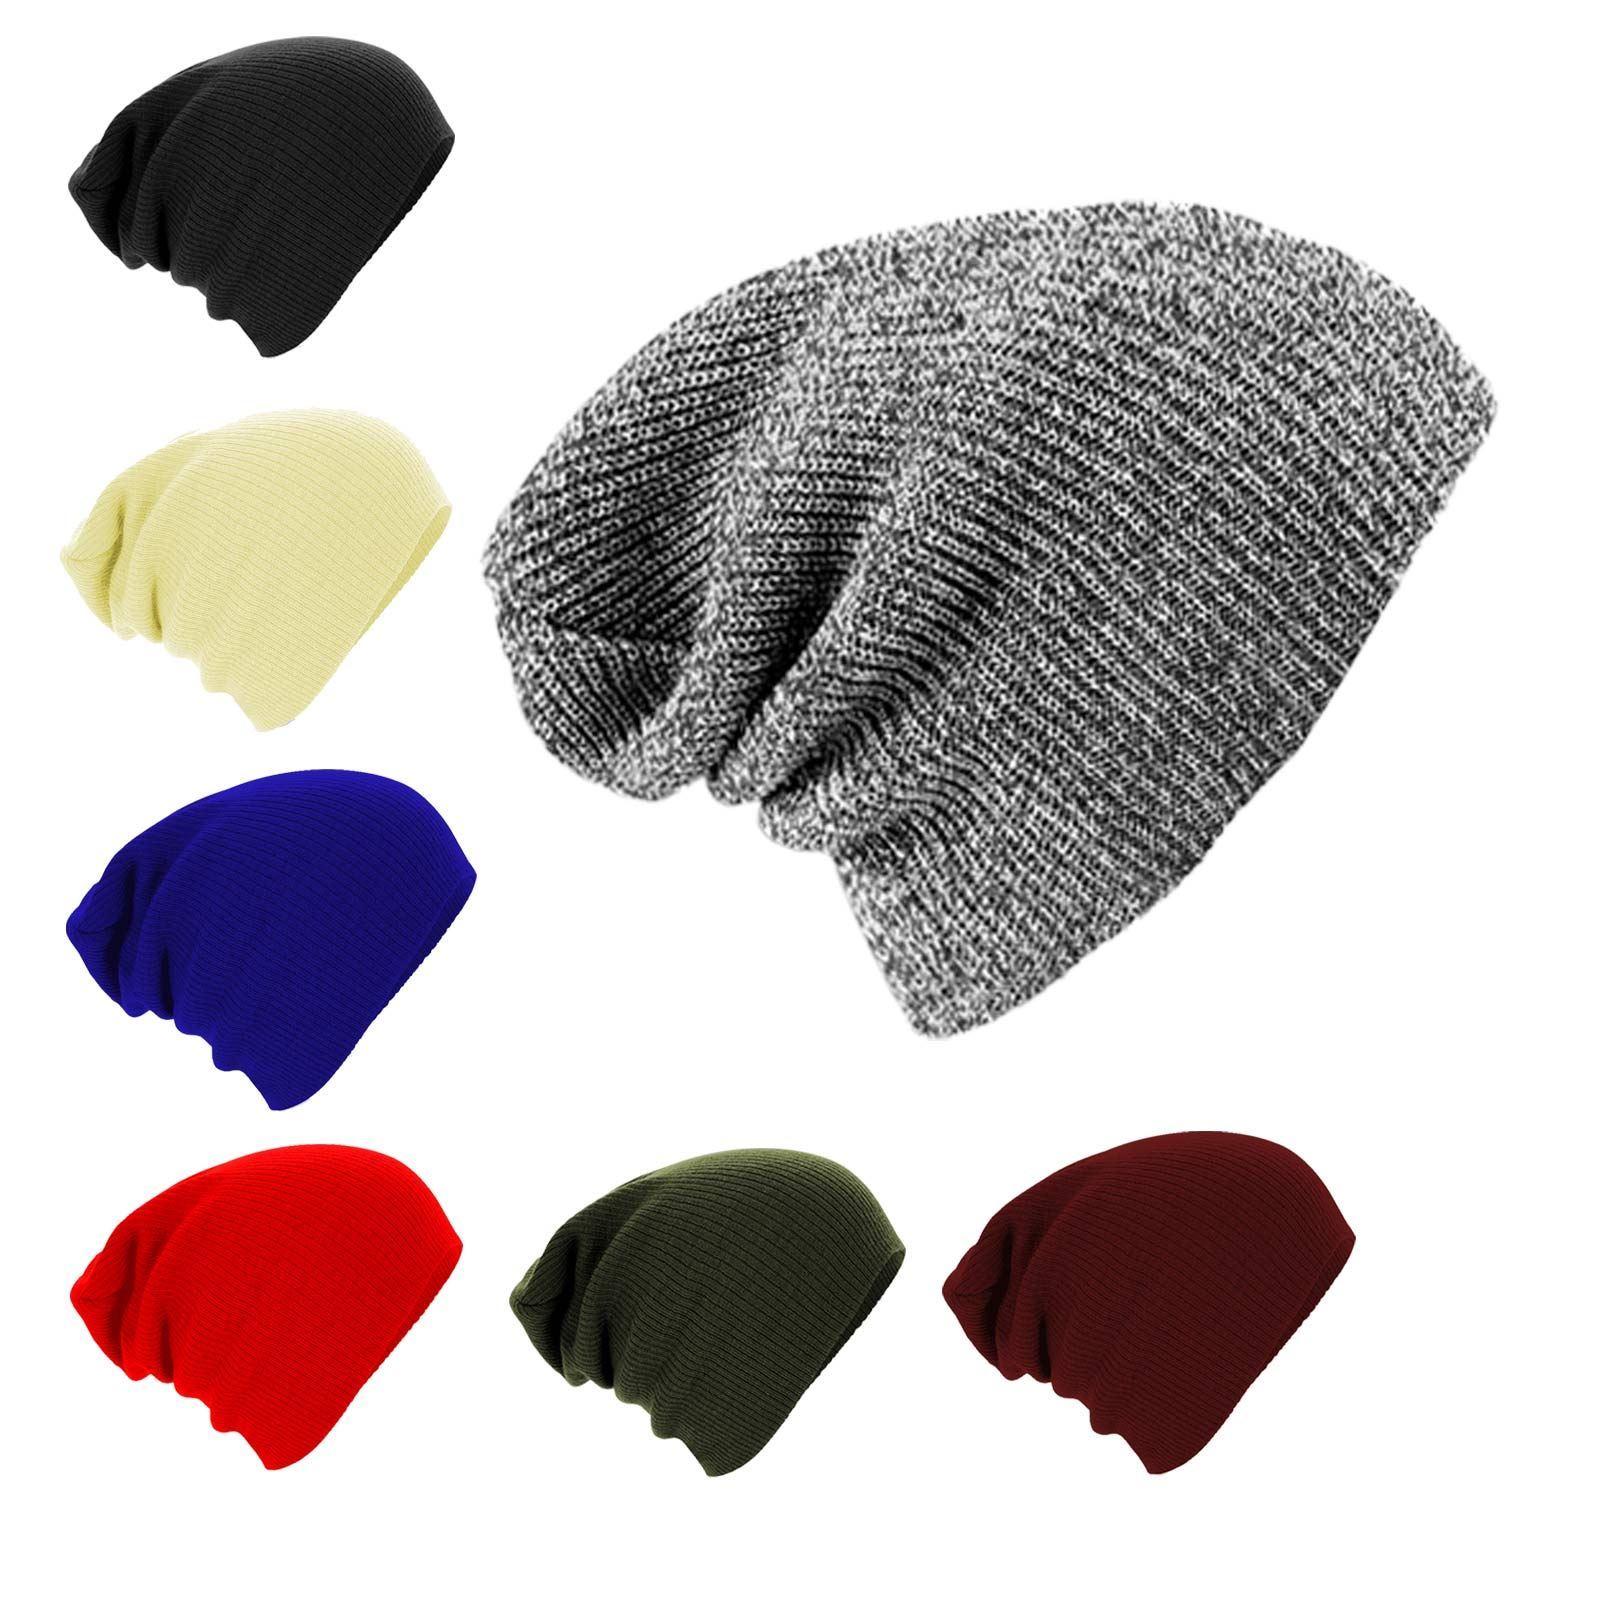 Knitting Pattern Floppy Beanie : Unisex Men Women Knitted Floppy Slouch Beanie Hat Chunky ...